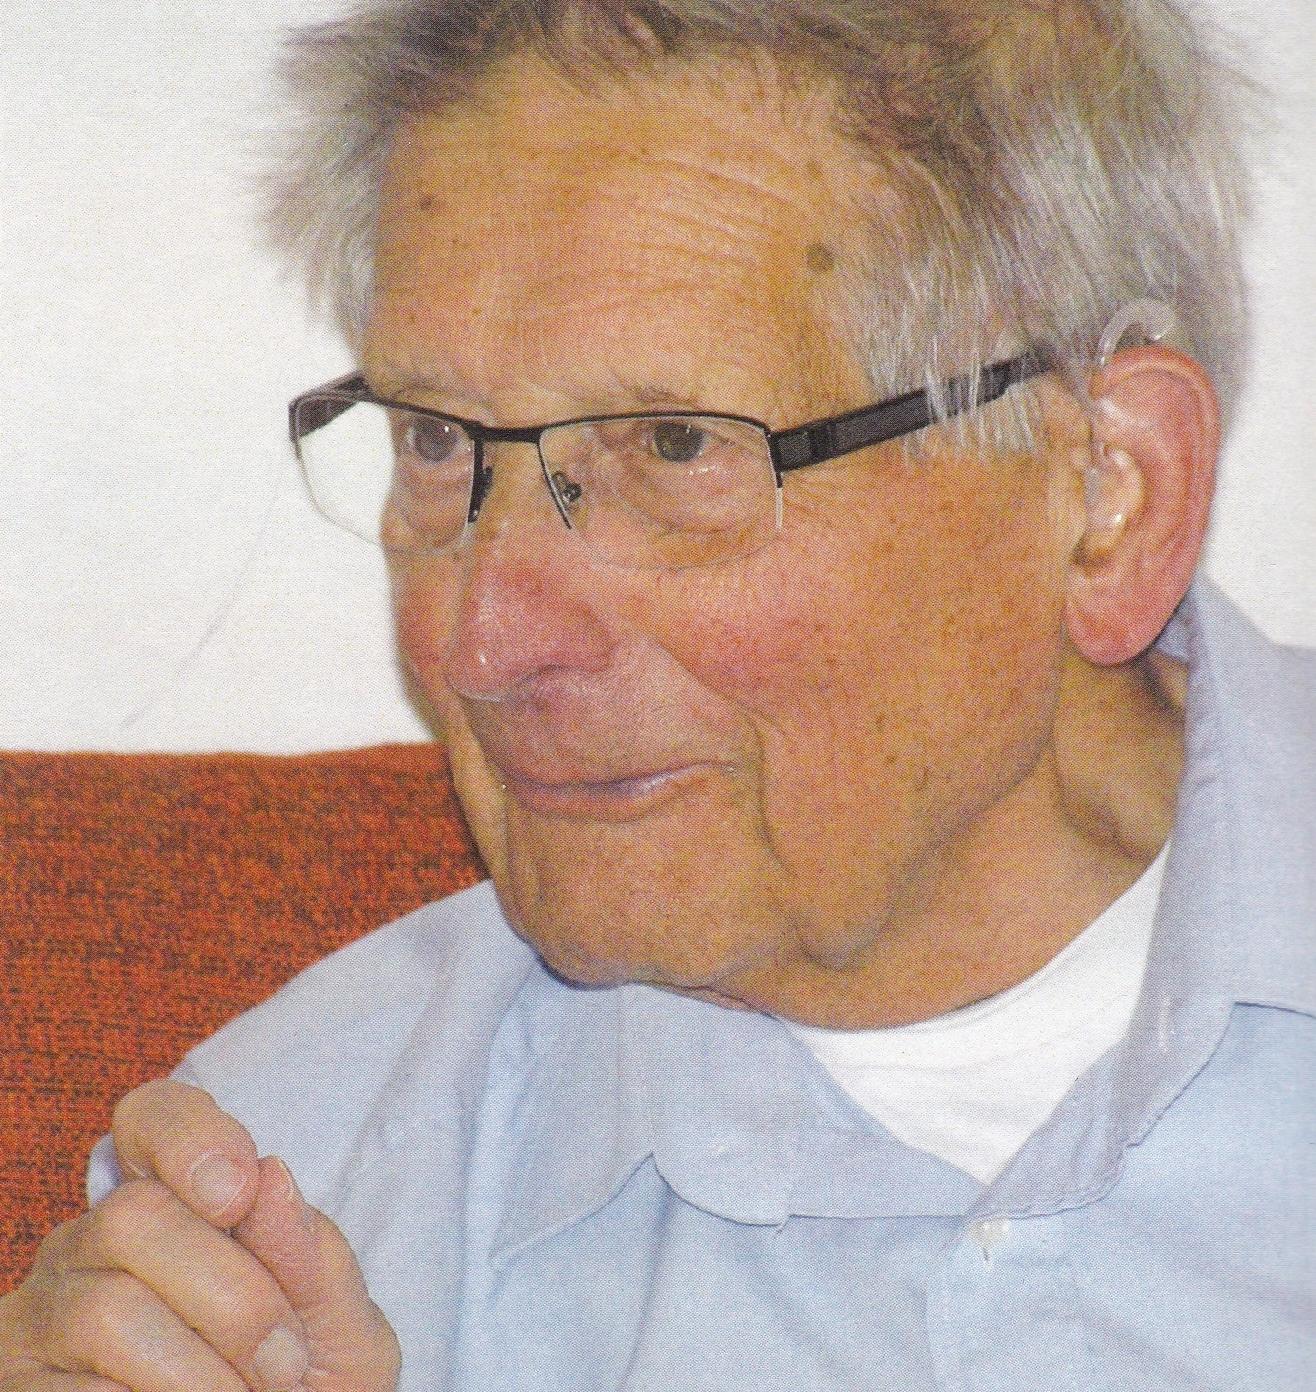 http://www.zengroeposhida.nl/inmemoriam/WimdenBiesen.jpg